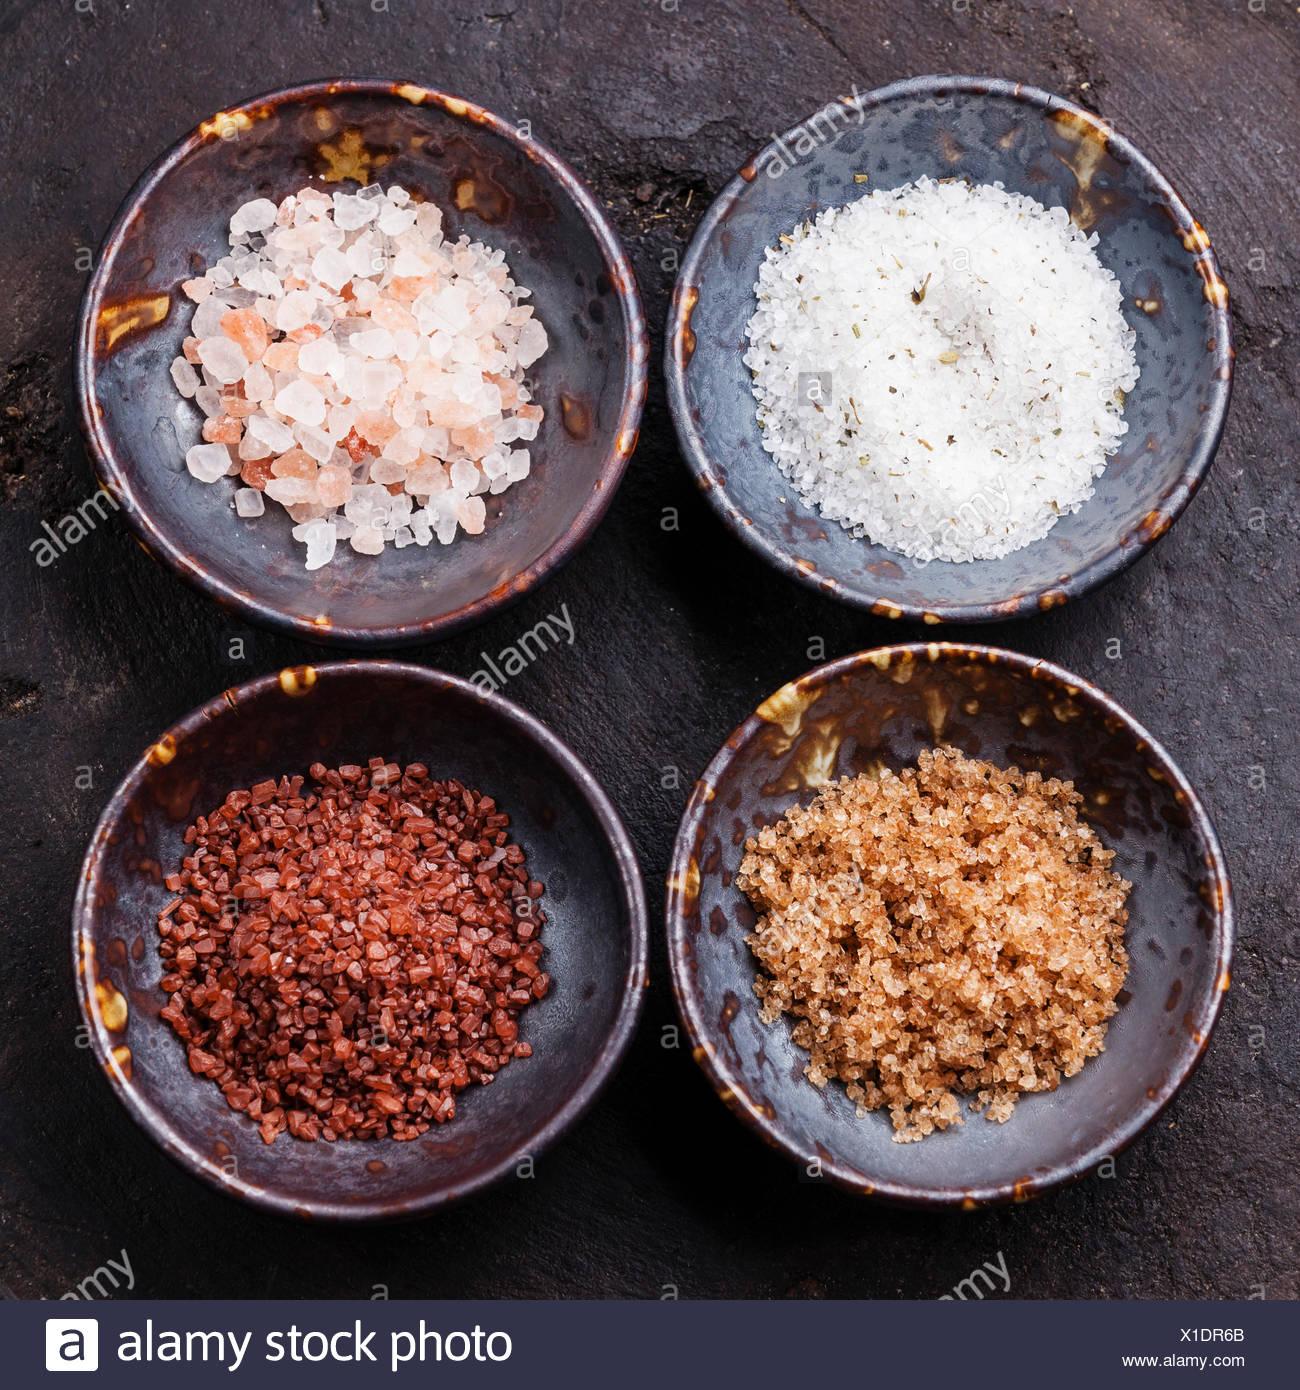 Different types of food coarse Salt in ceramic bowls on dark background - Stock Image